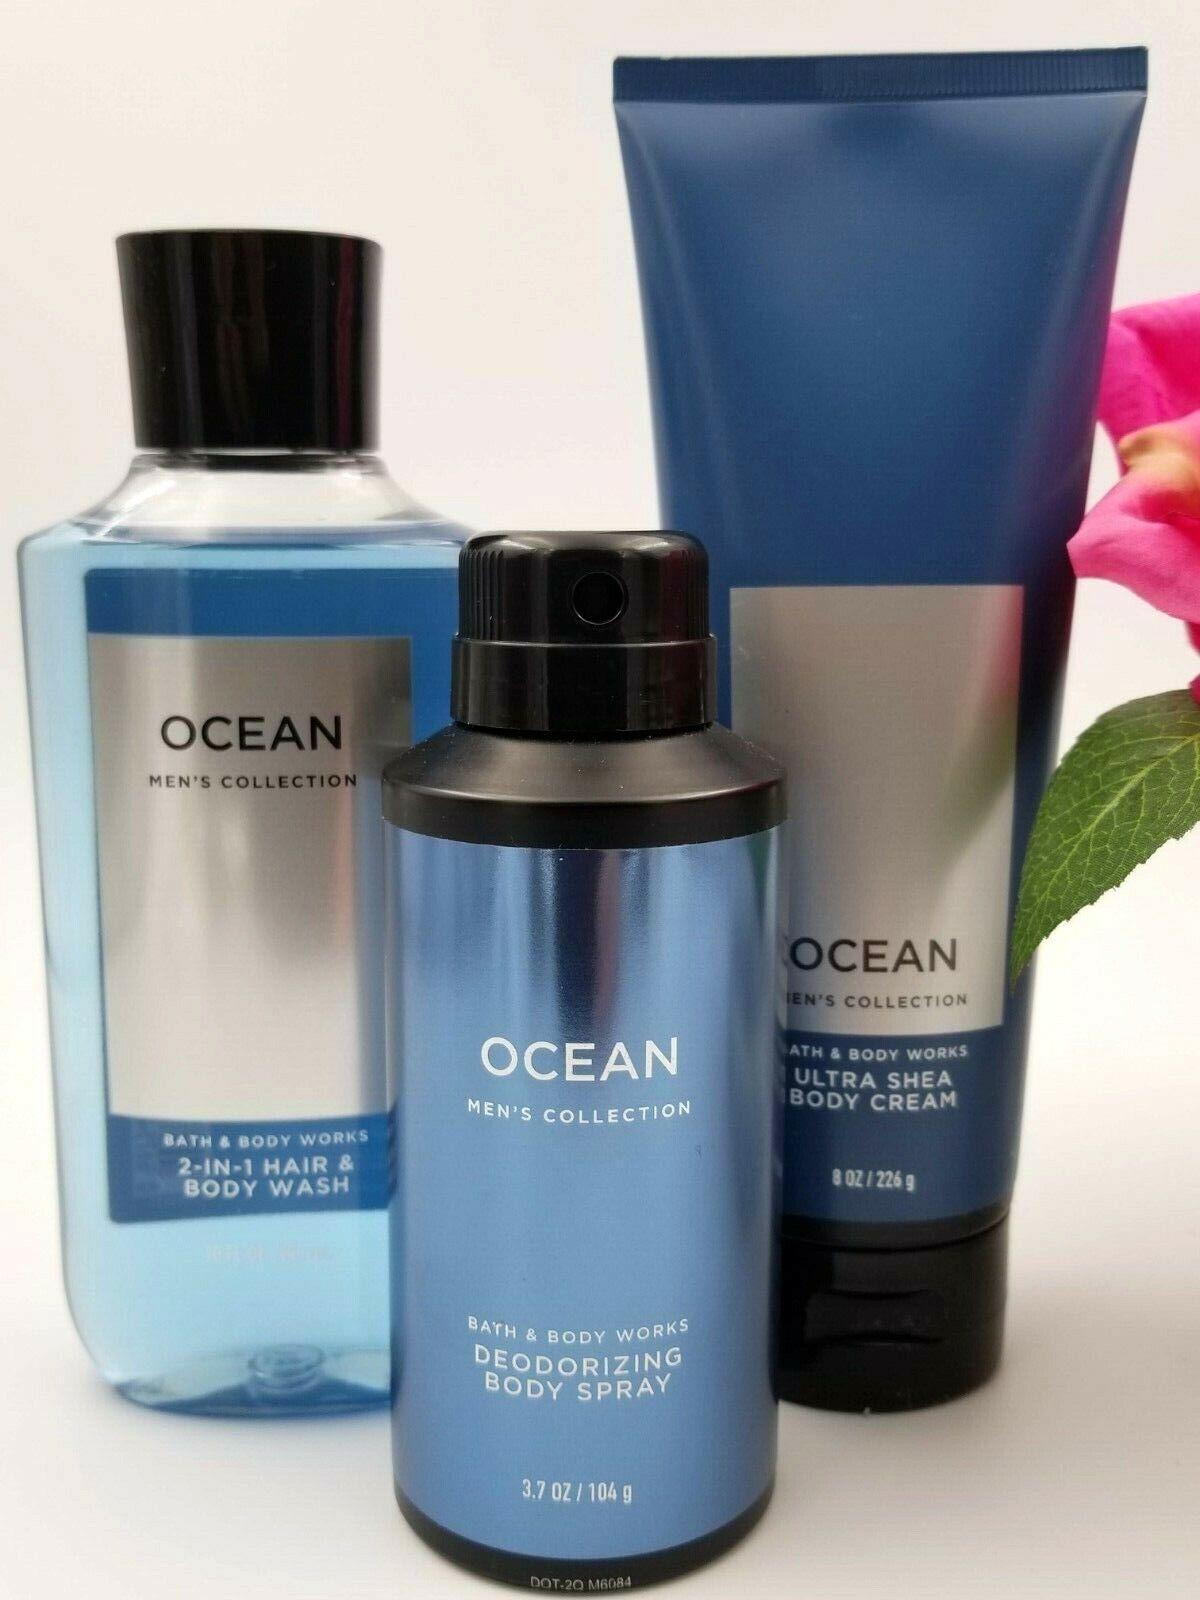 NEW BATH & BODY WORKS OCEAN MEN'S 2 IN 1 HAIR BODY WASH SHOW